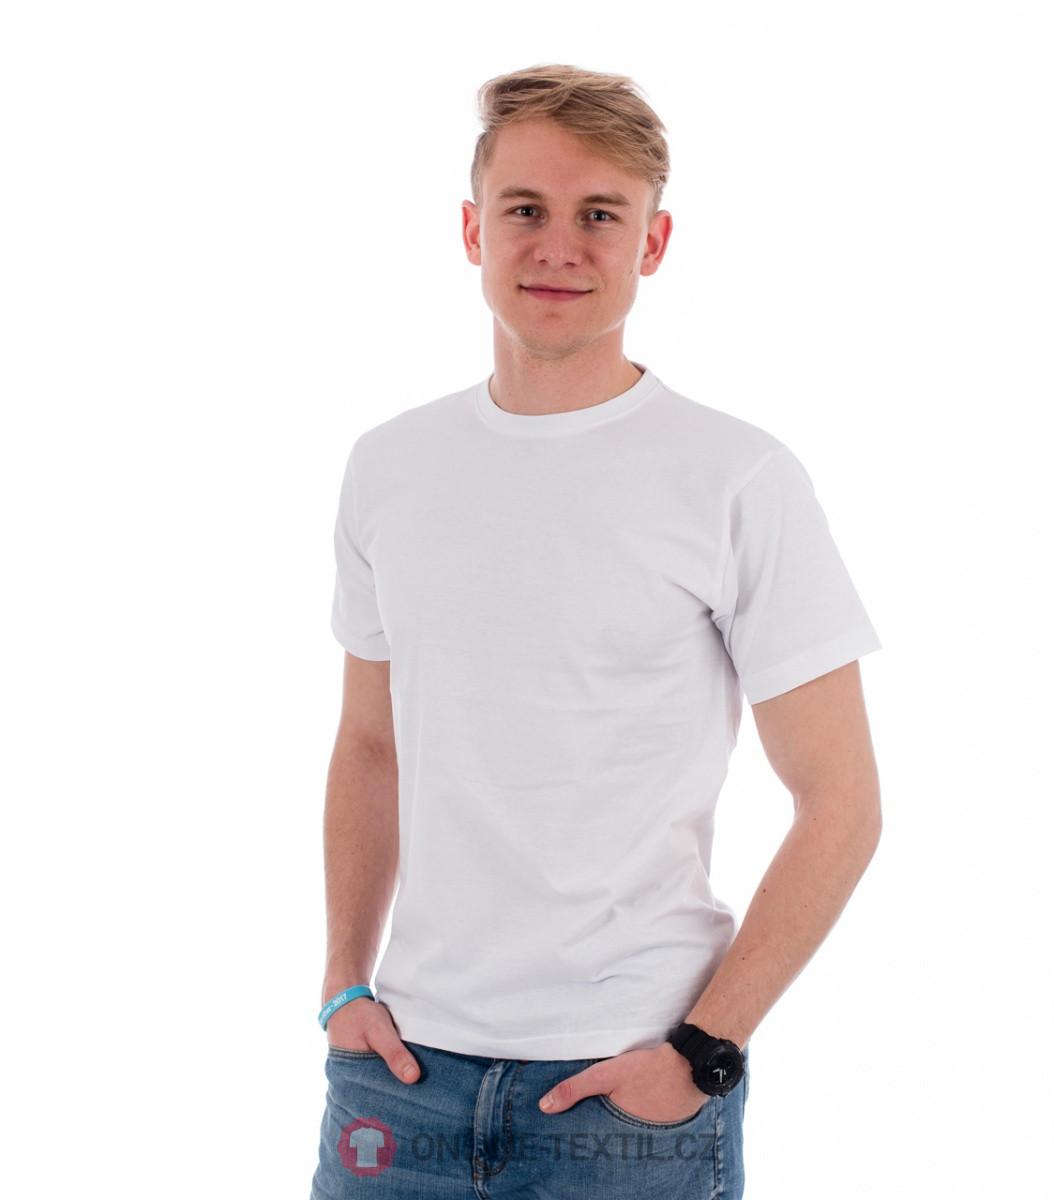 89a0da811aeb ADLER CZECH Gents T-shirt Basic 129 - white from the MALFINI ...